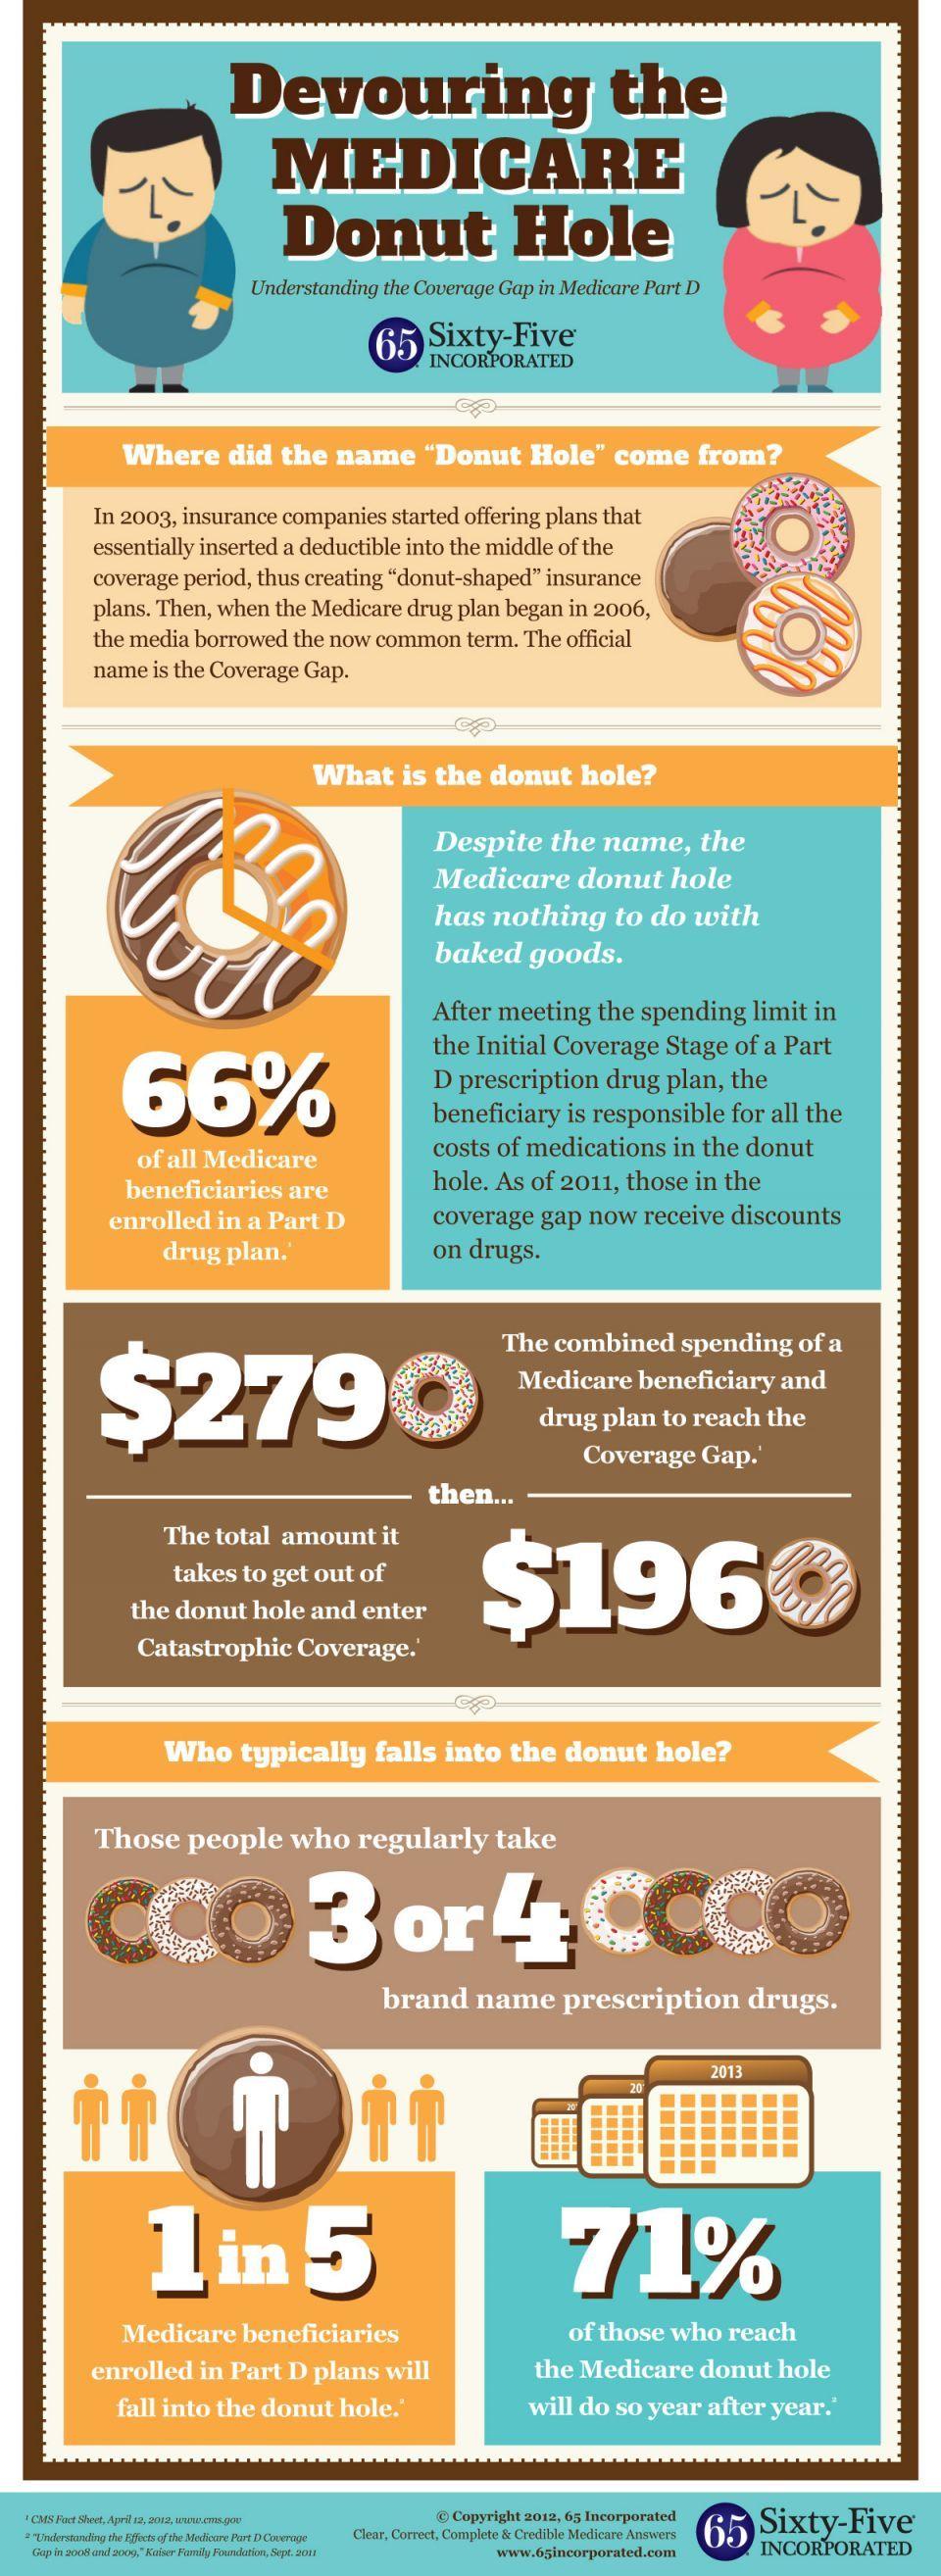 Do You Have A Medicare Part D Prescription Drug Plan If You Do